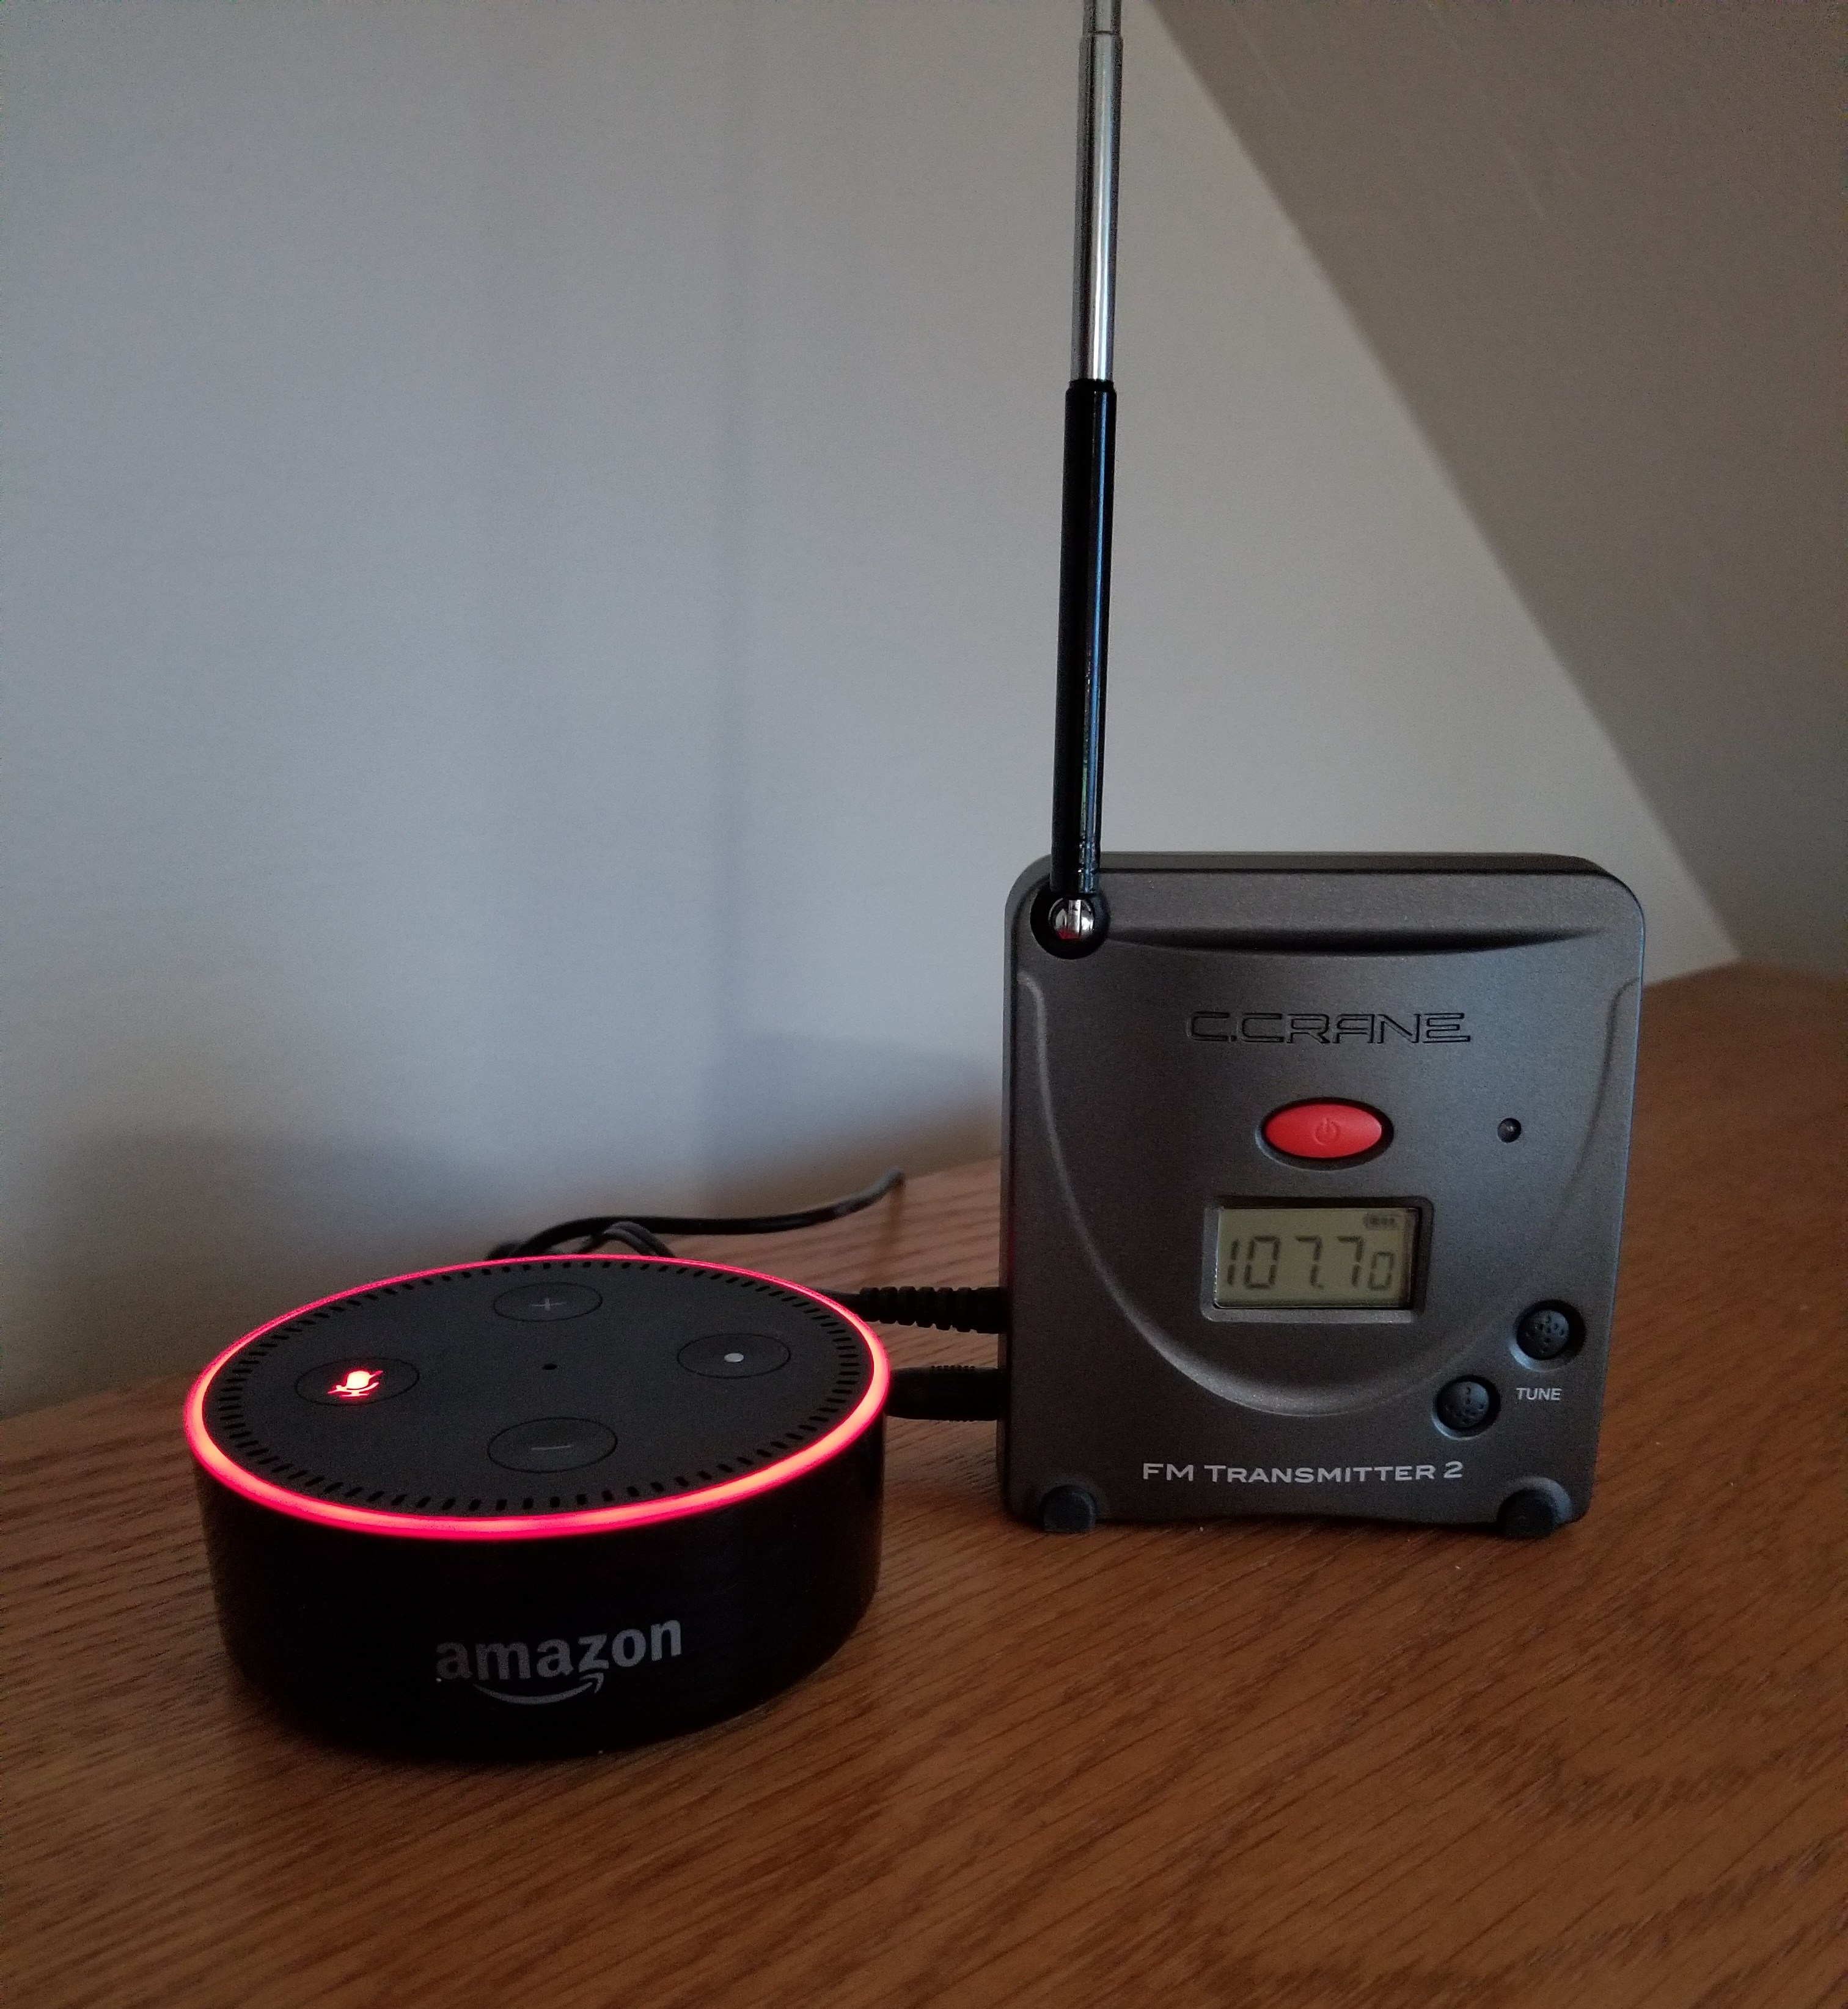 A Hackers Guide To Alexa C Crane Blog Hacks And Mods Easy Use Fm Radio Receiver